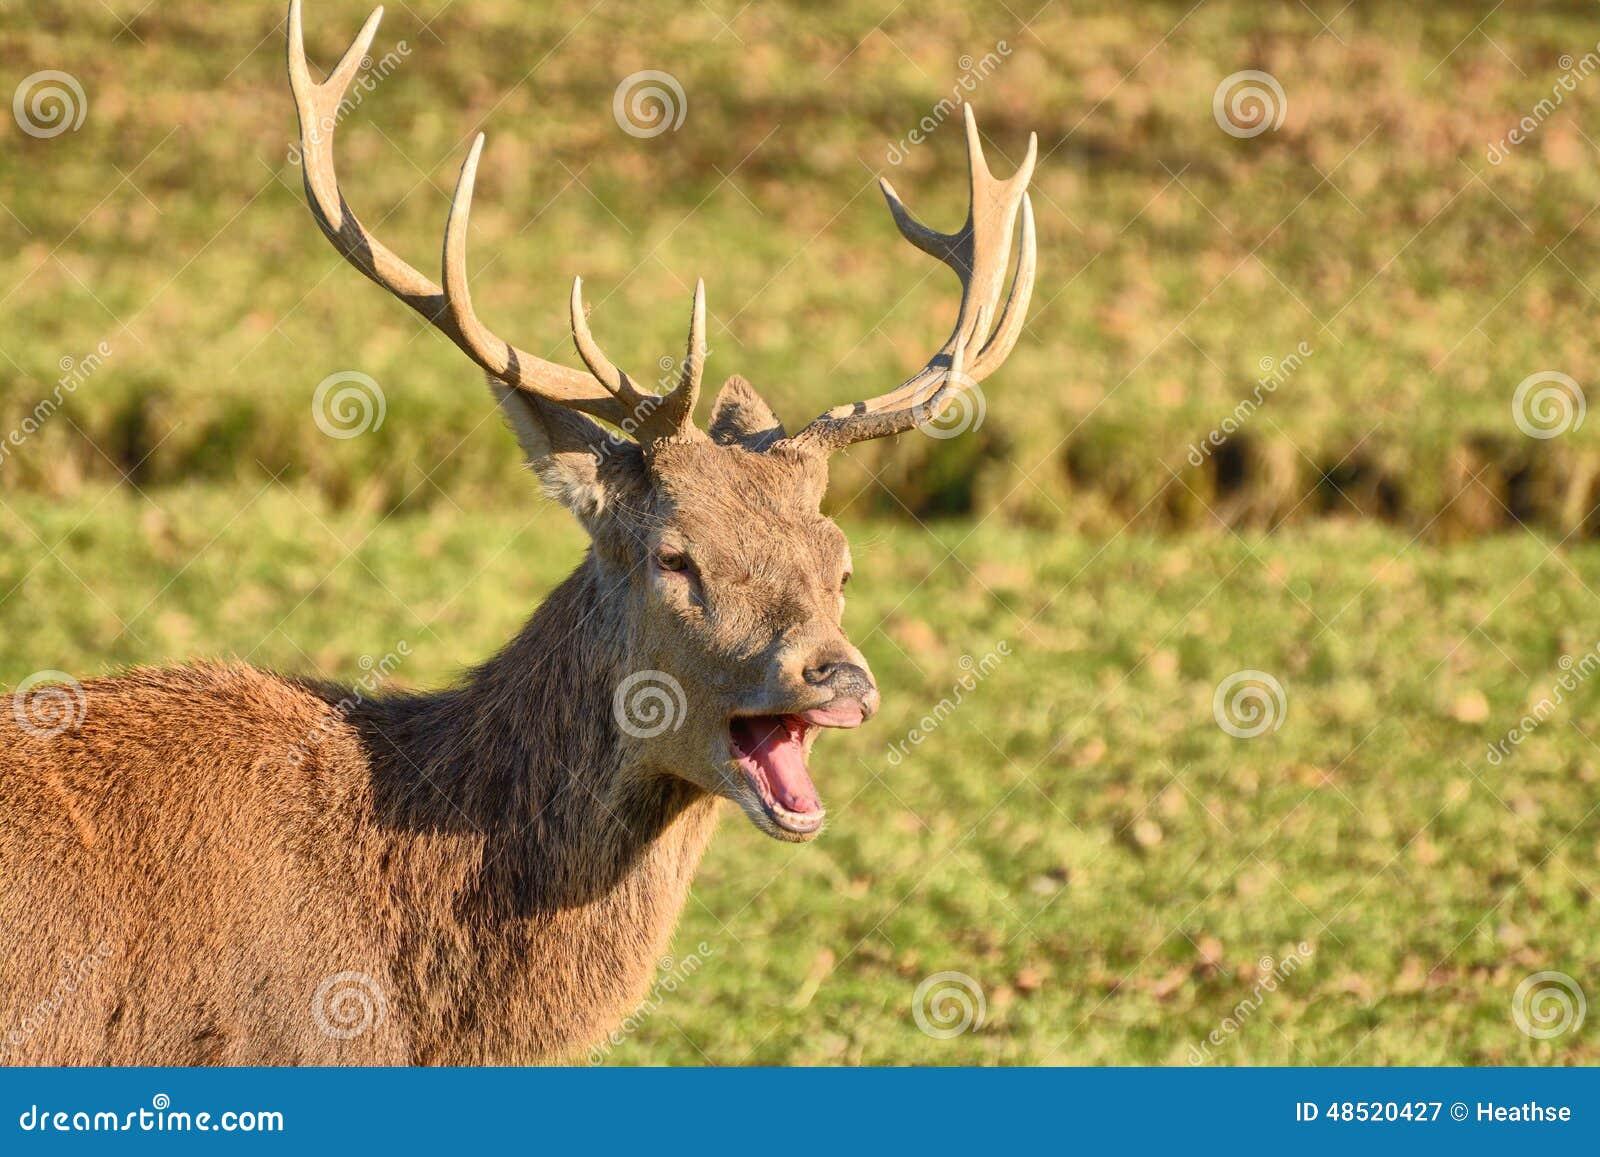 Red deer laughing/yawning stock image. Image of laugh ... - photo#36